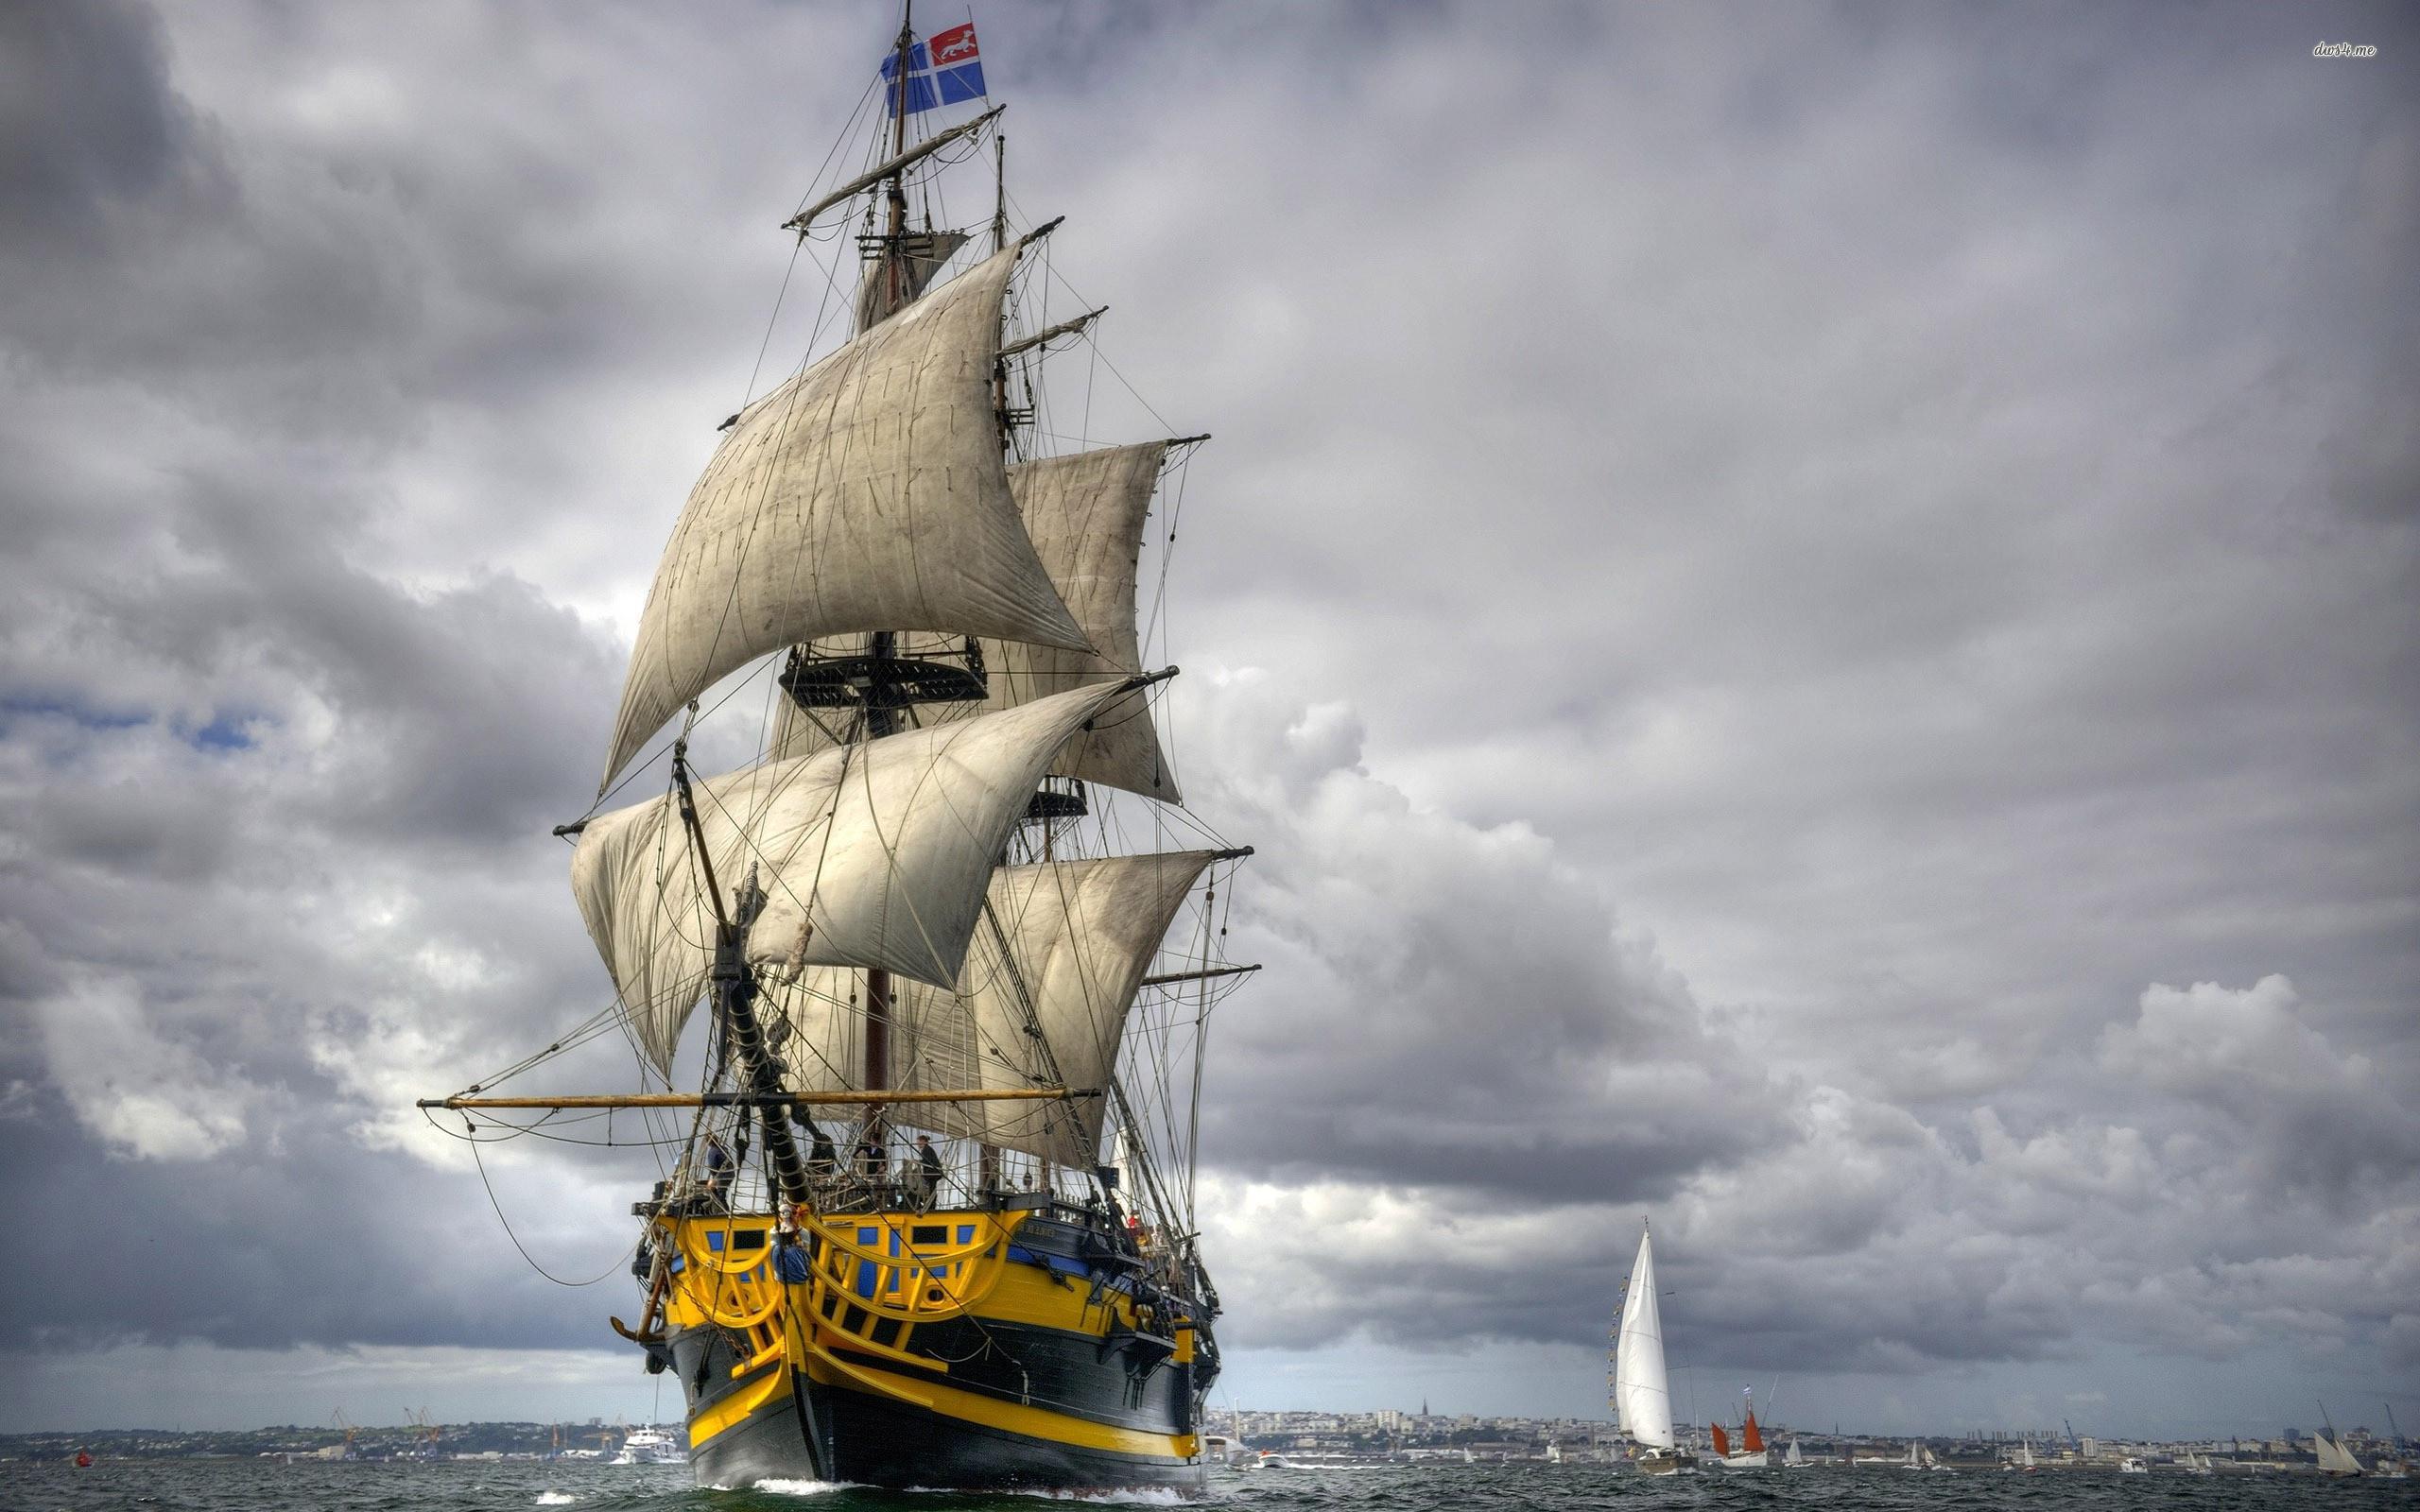 Res: 2560x1600, Sailing ship wallpaper